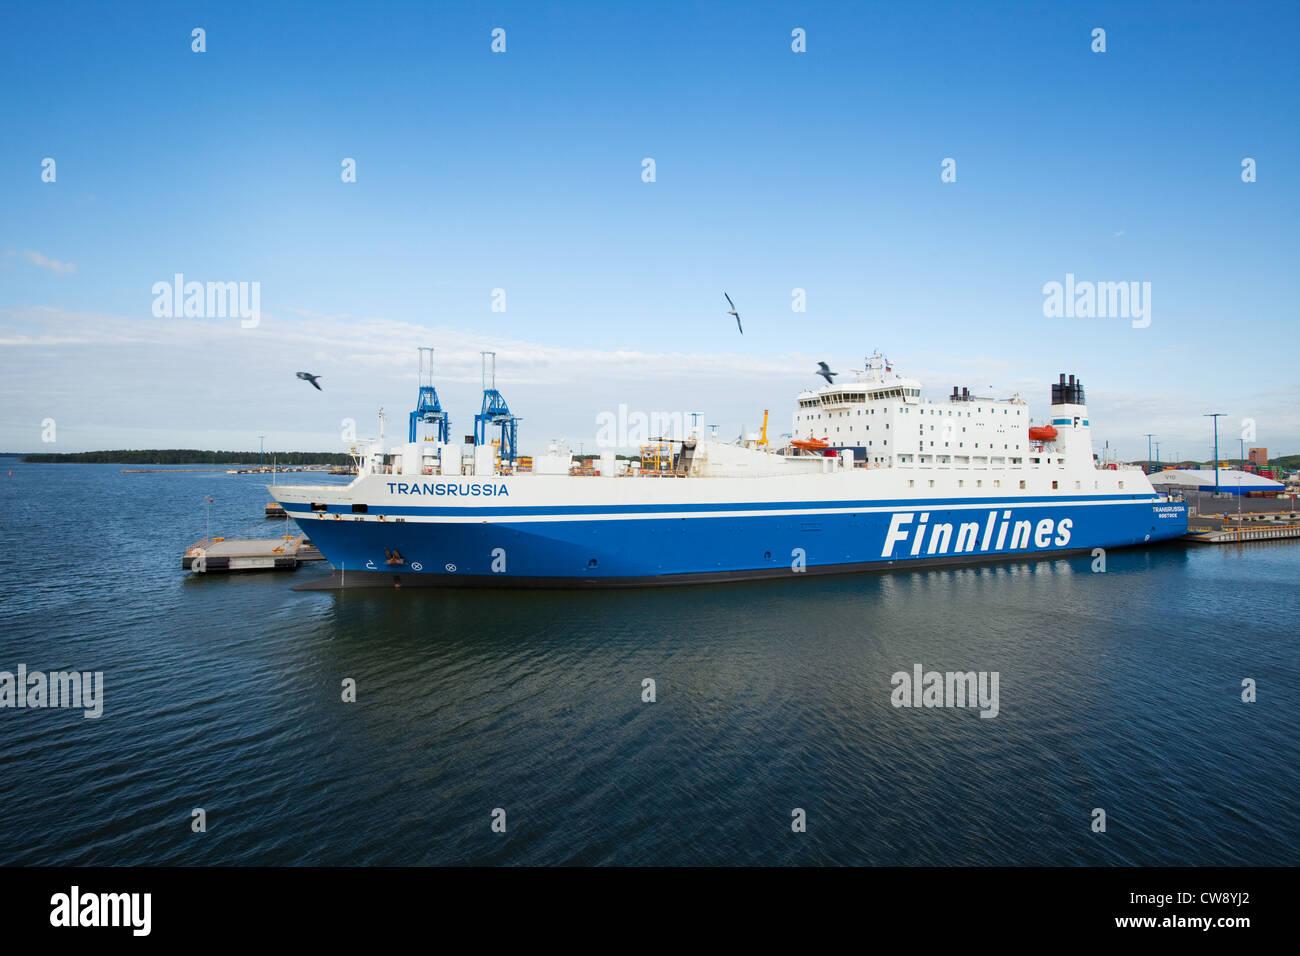 Finnlines at Vuosaari Harbour - Port of Helsinki - Stock Image